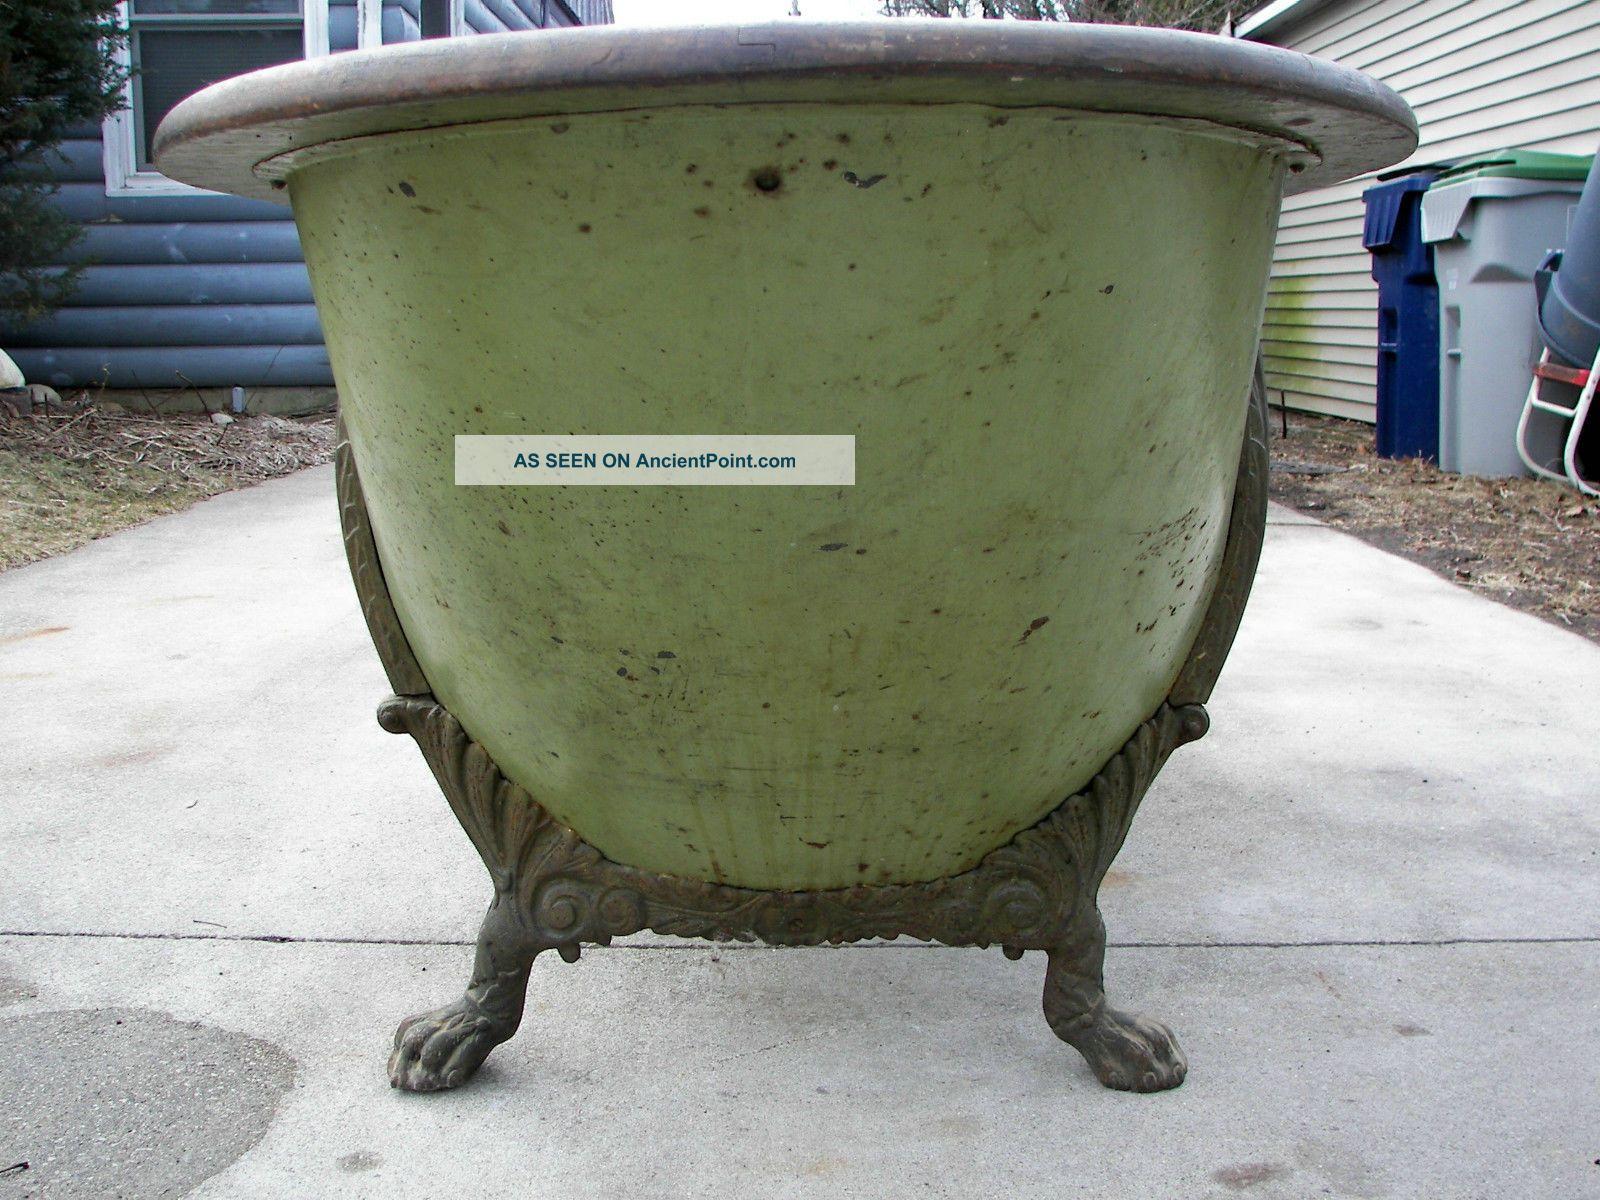 Antique Victorian Oak Rimmed Copper Lined Bathtub Very Rare W/ Ornate Claw Feet Bath Tubs photo